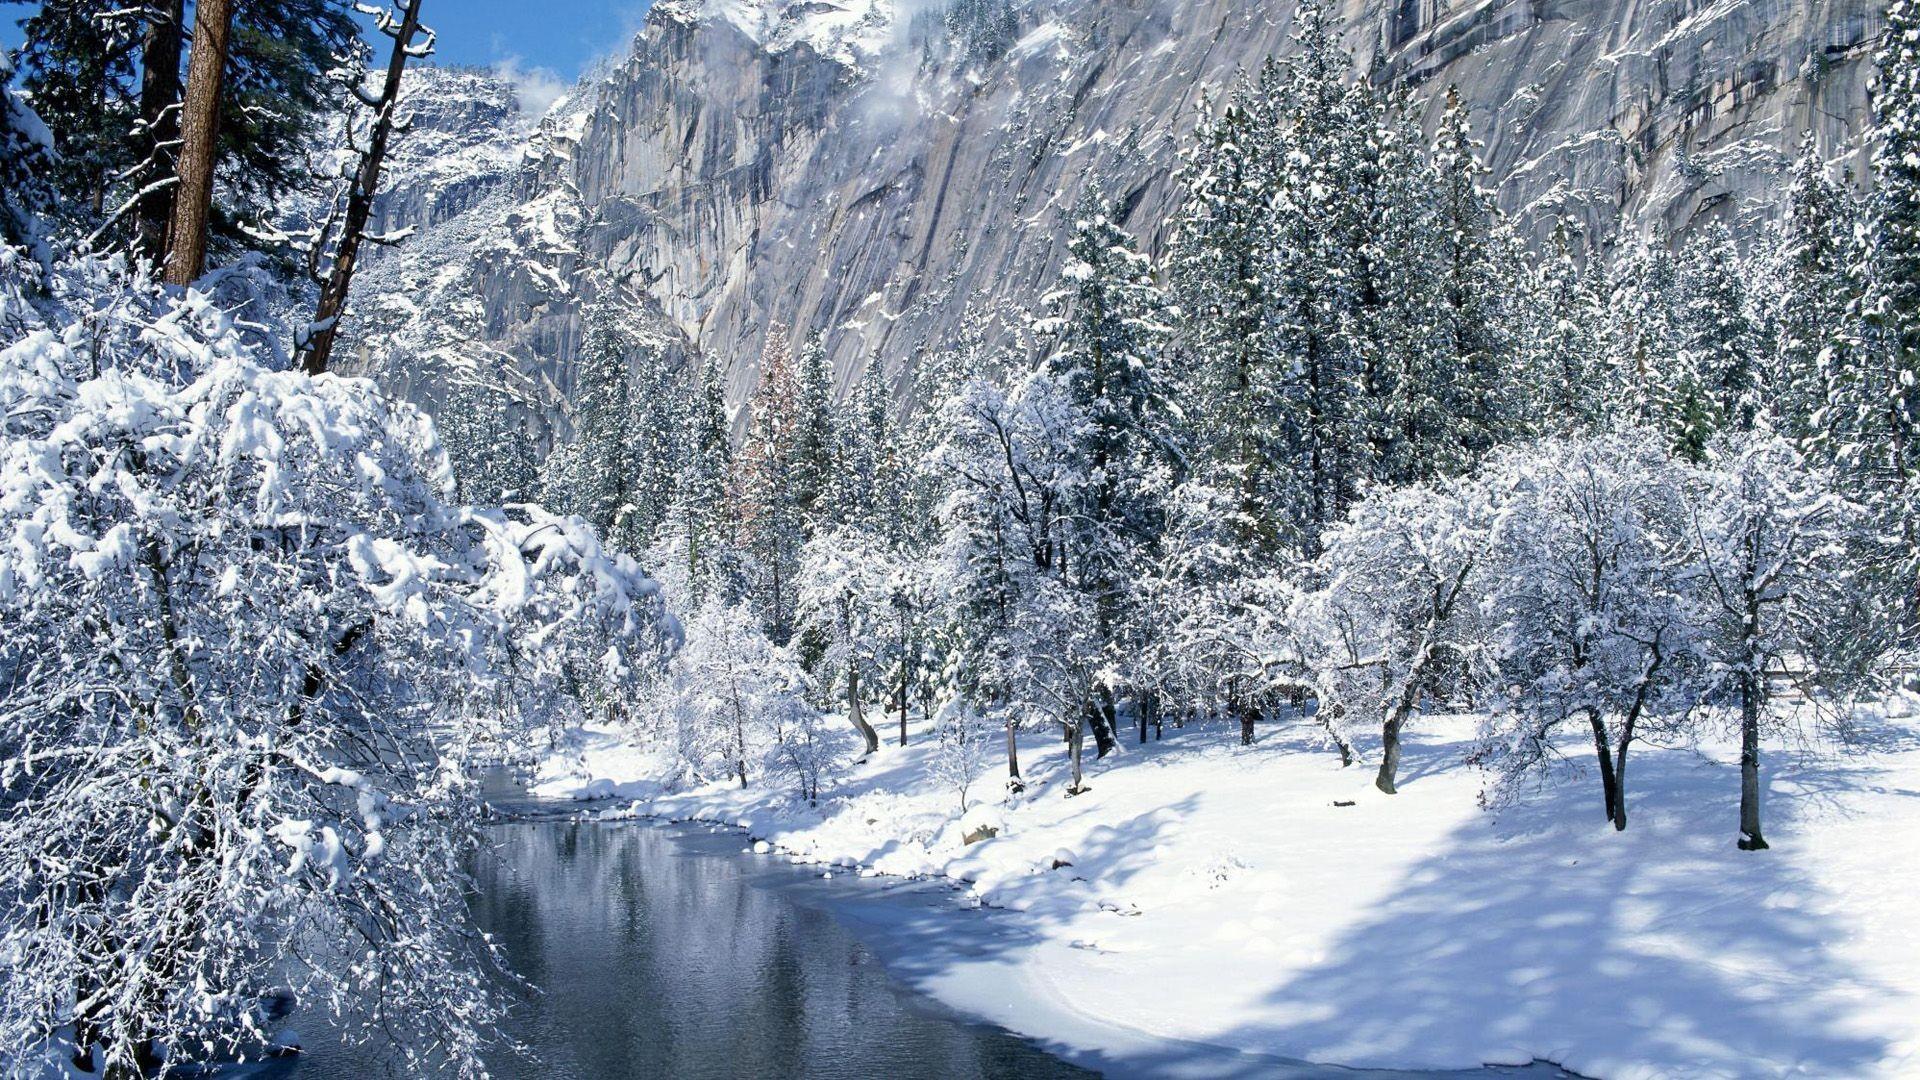 winter desktop backgrounds for windows 7 –